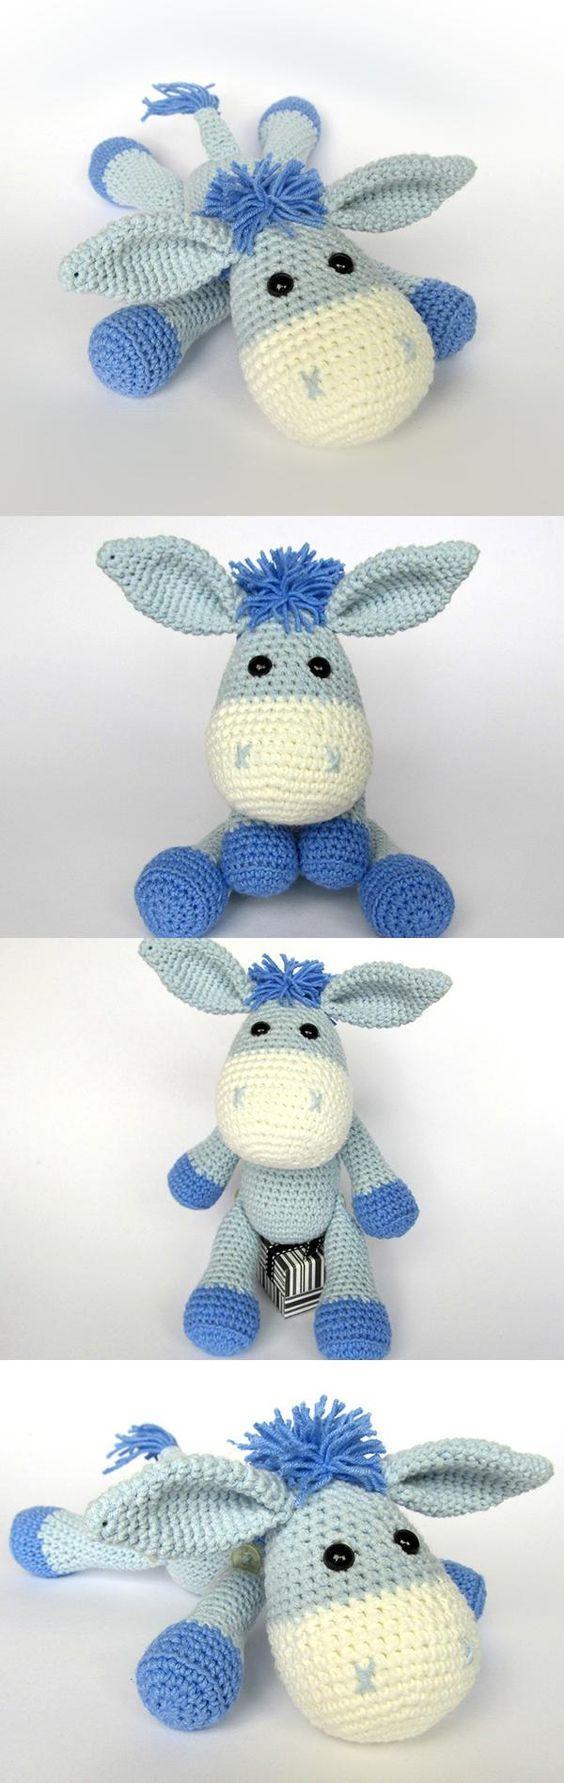 Donkey Ruda amigurumi pattern by DioneDesign | Pinterest | Patrones ...